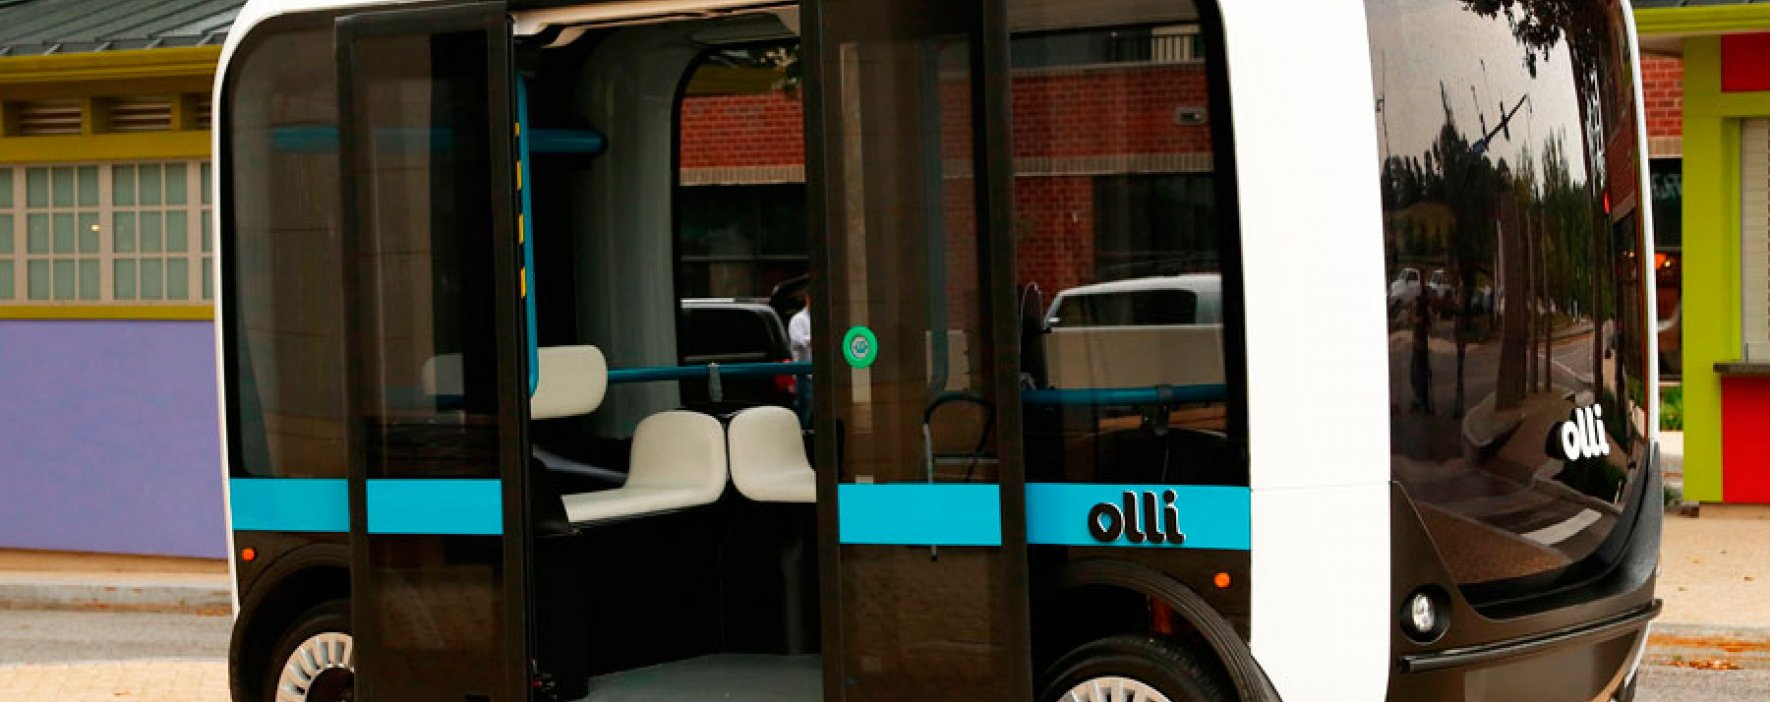 Minibús creado por colombiano será usado como transporte colectivo